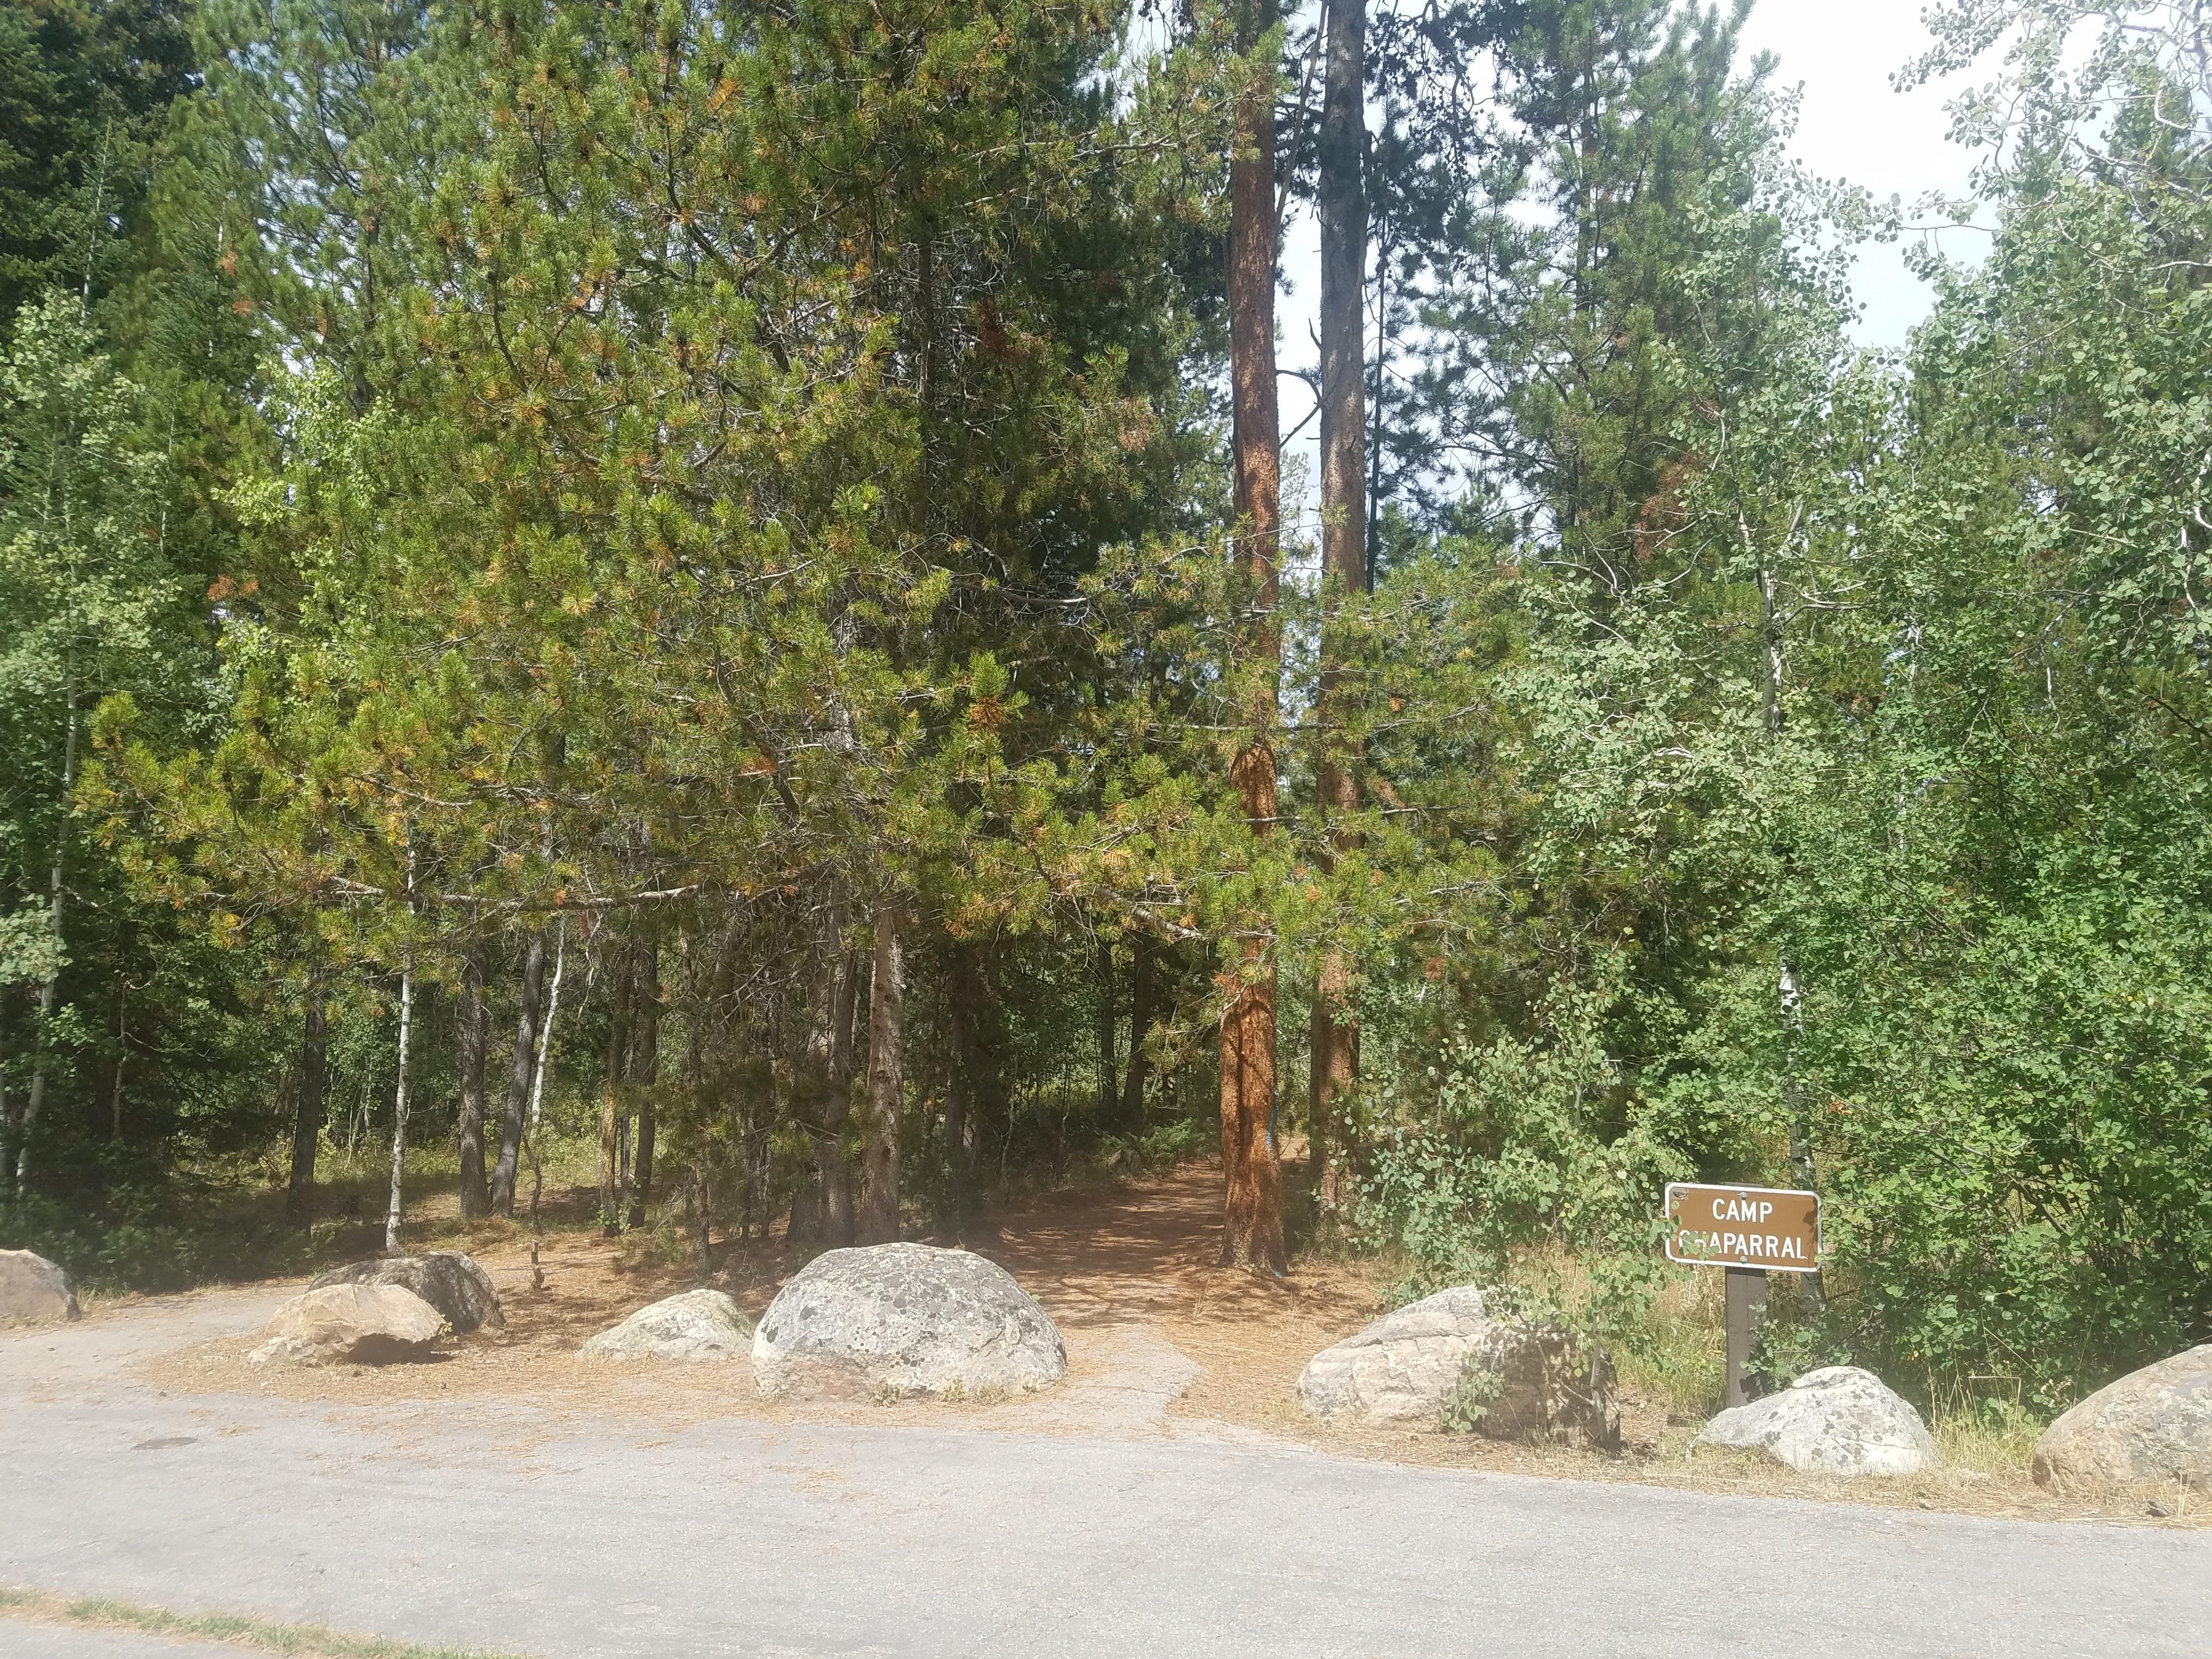 Pine Valley North Wasatch Cach, UT | The Dyrt